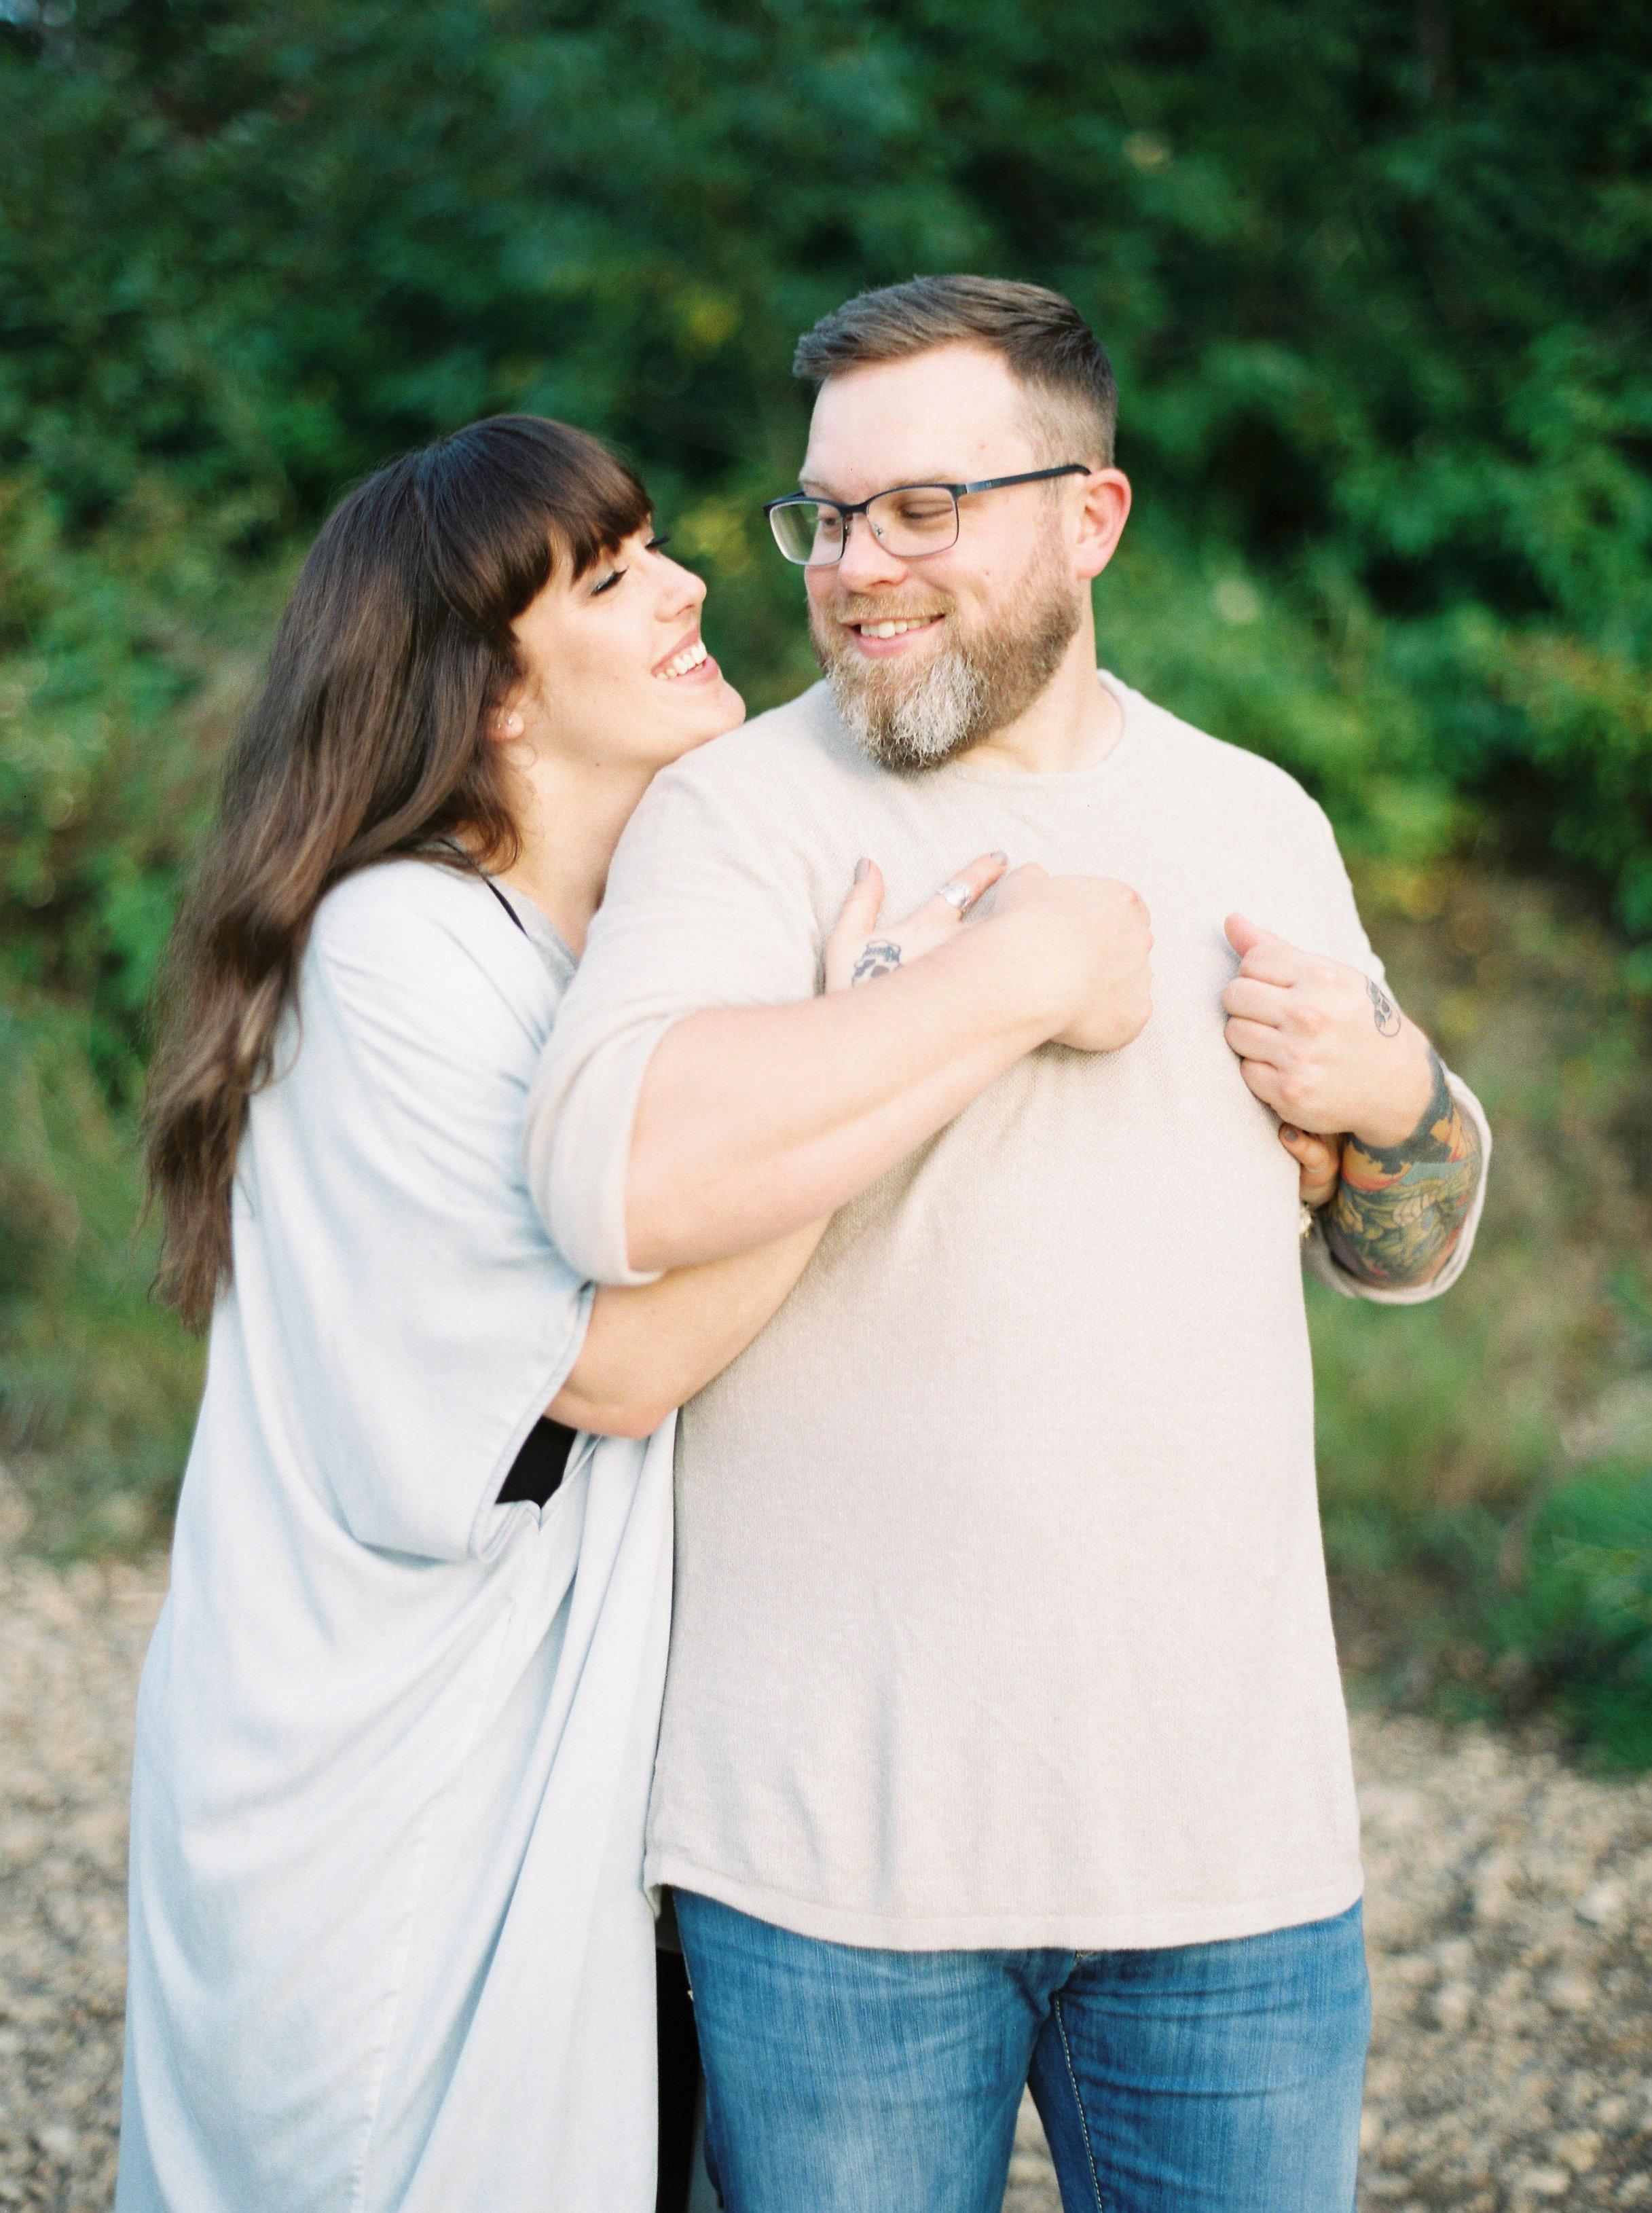 Christine&Sean_FirstGlanceStudios-20.jpg